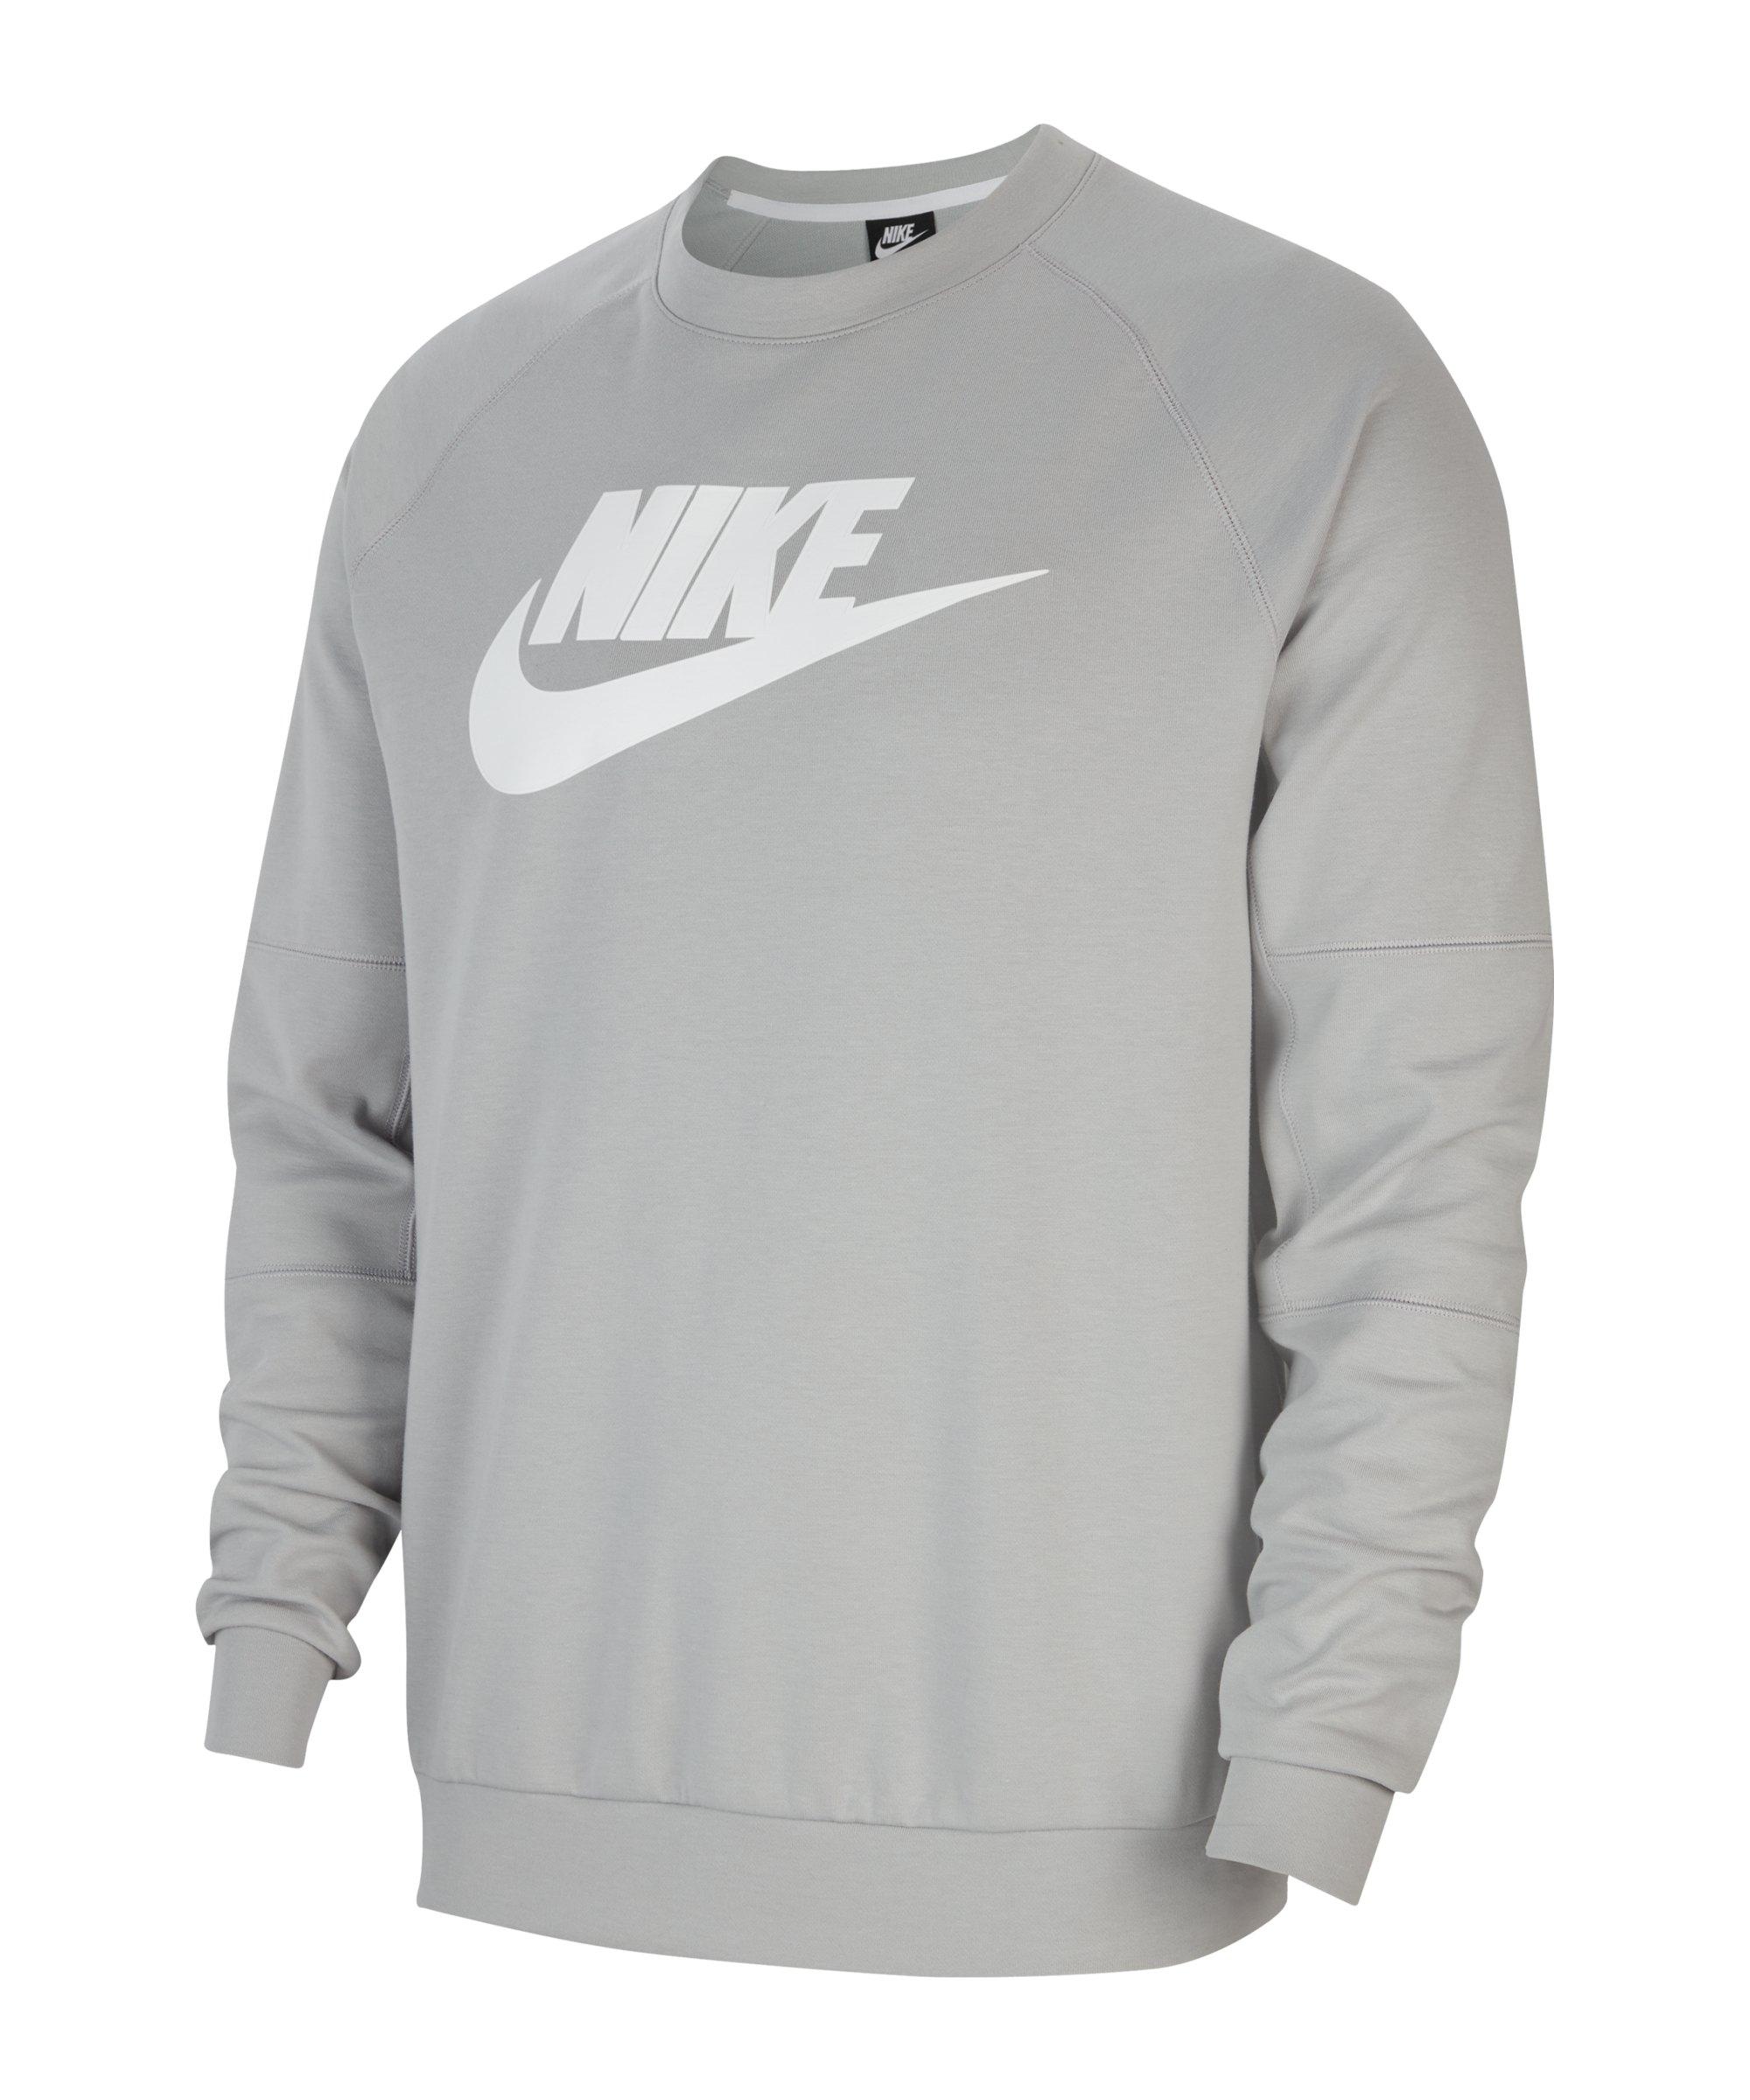 Nike Modern Fleece Crew Sweatshirt Grau F077 - grau